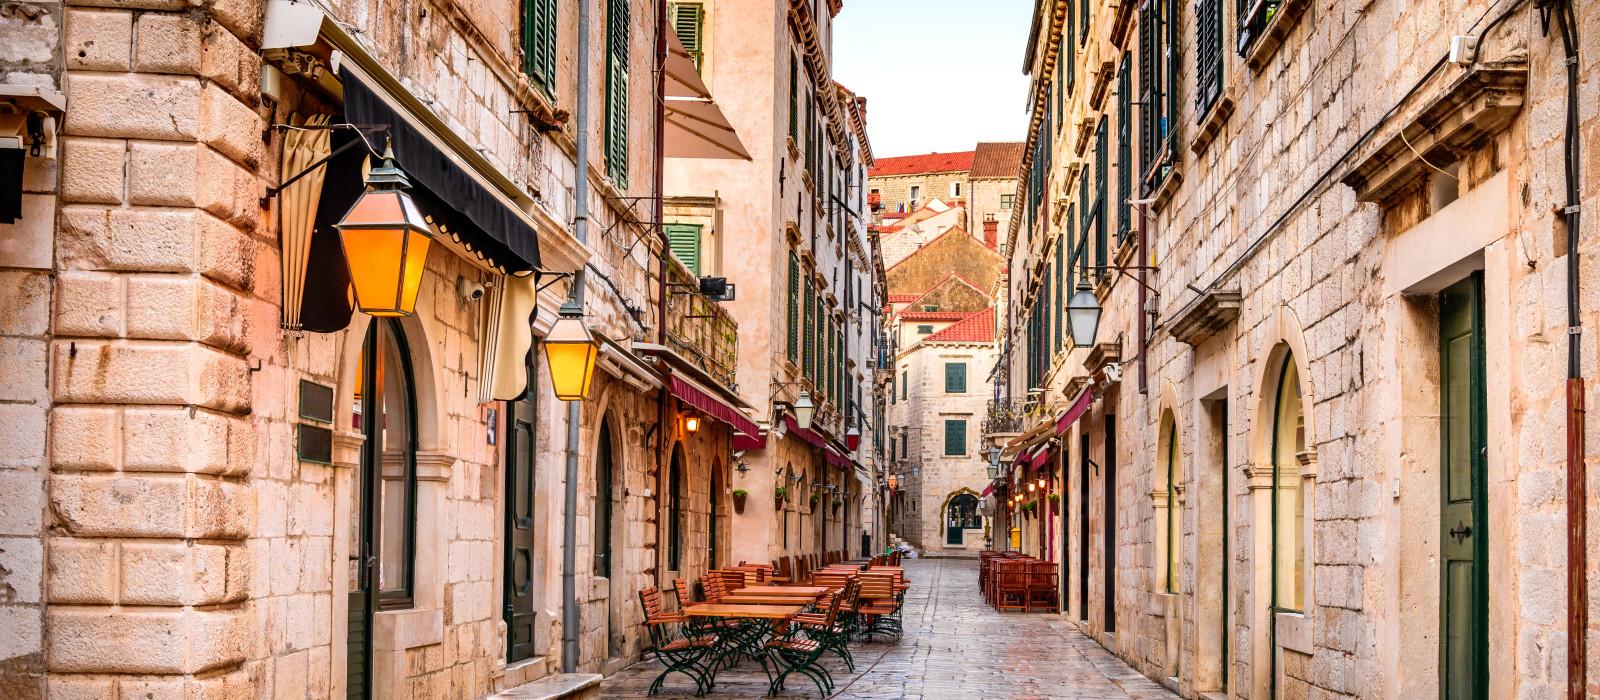 Destination Dubrovnik Croatia & Slovenia